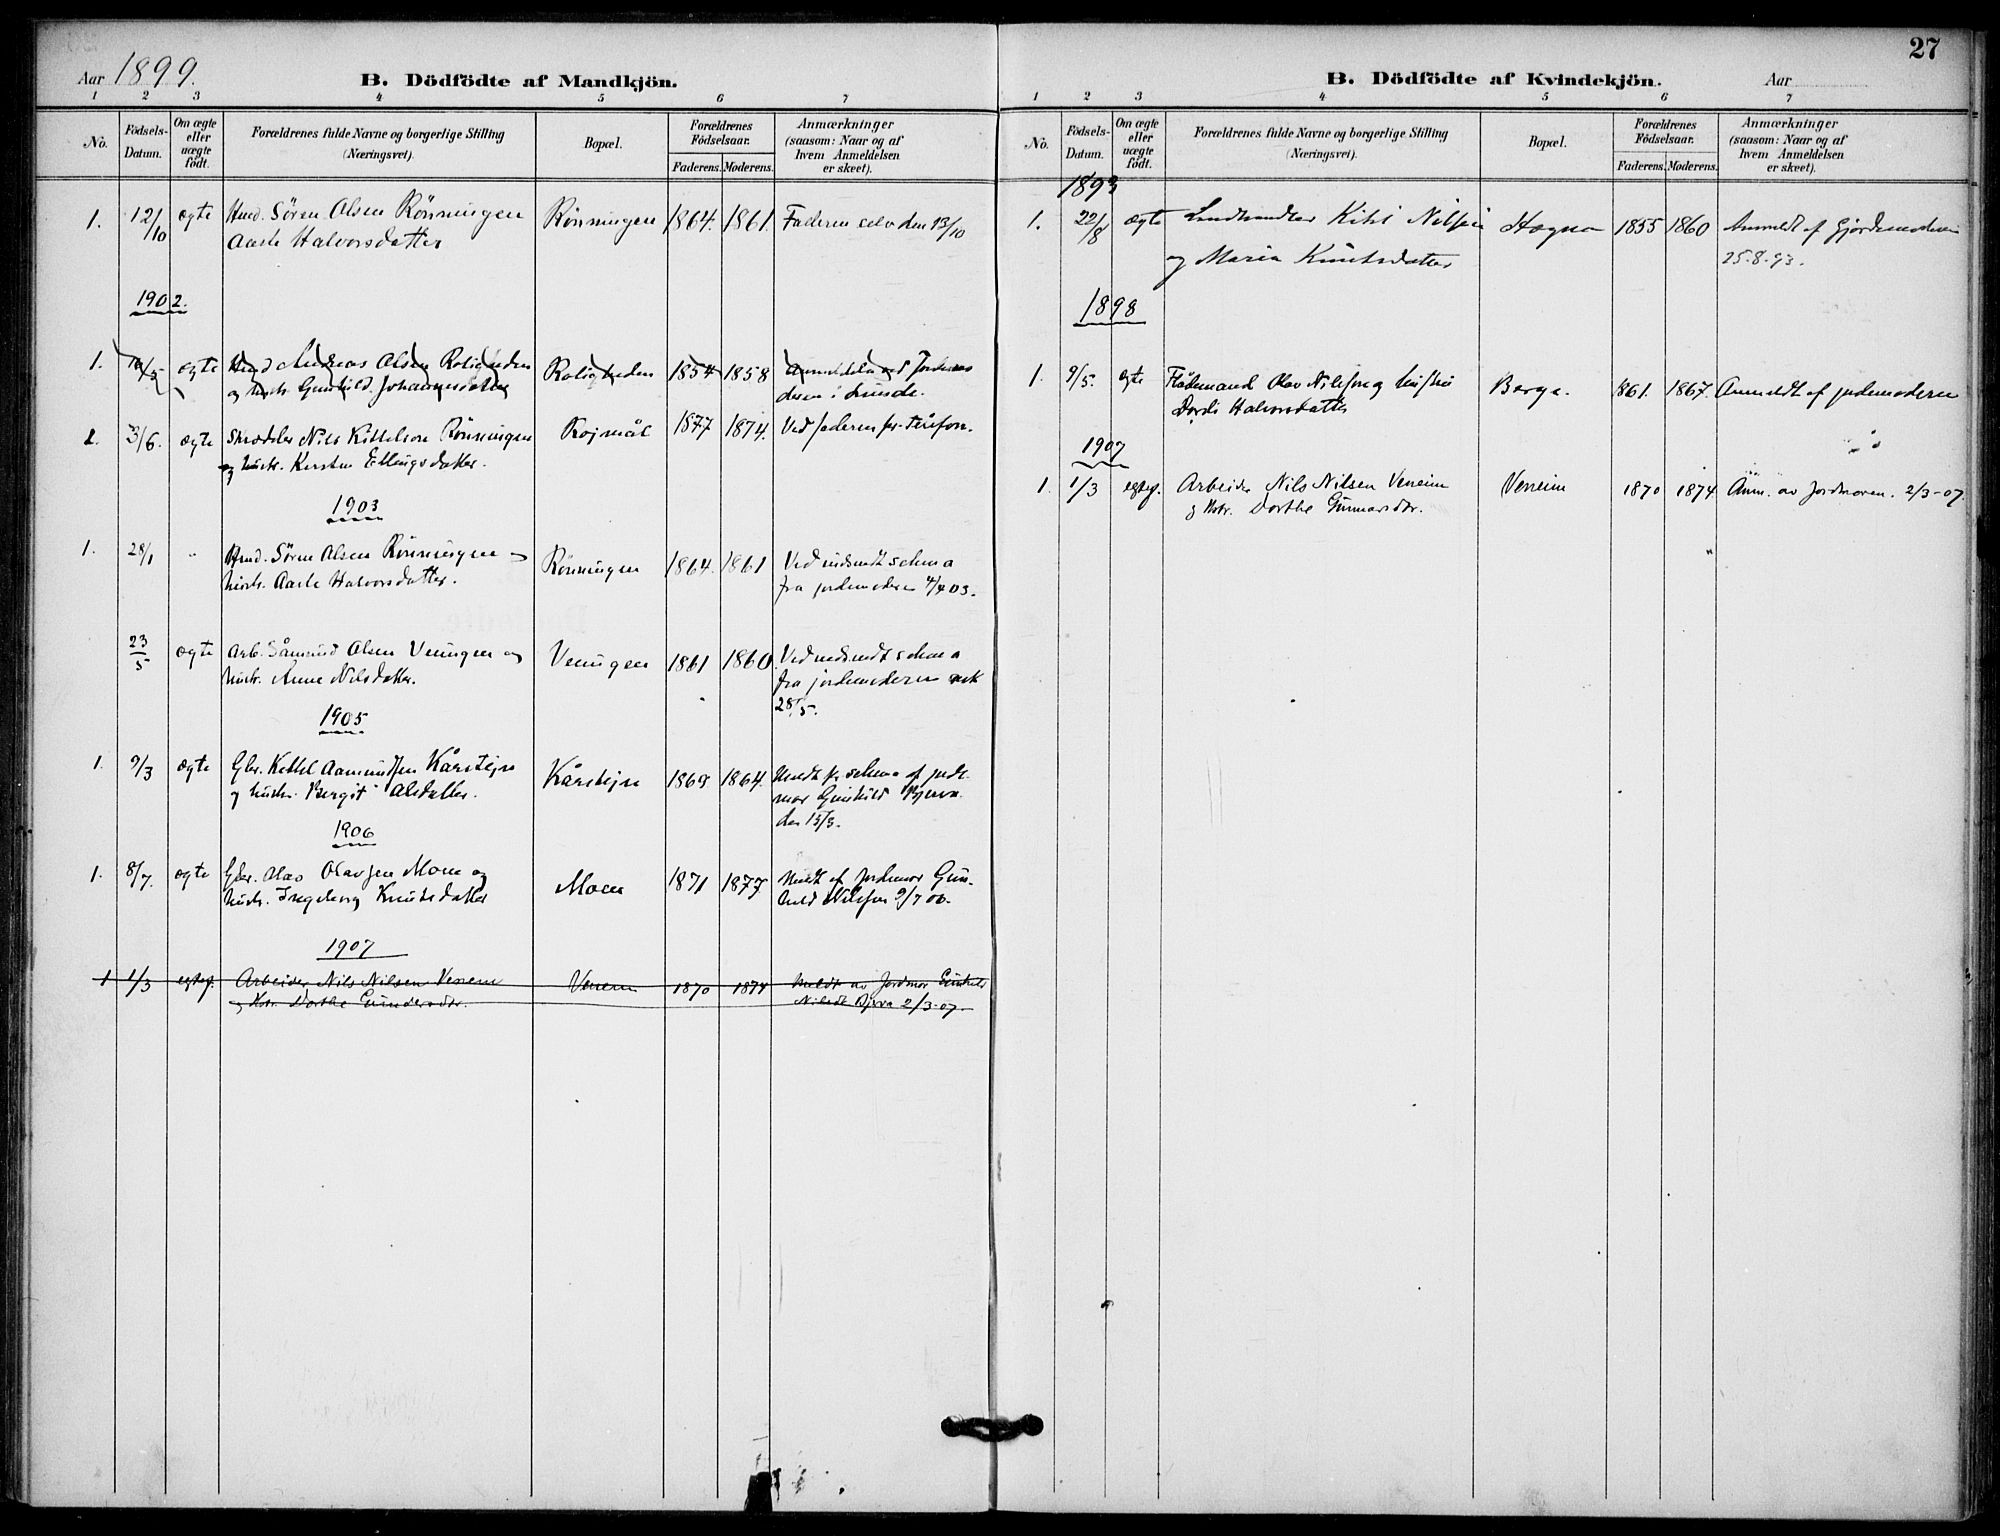 SAKO, Lunde kirkebøker, F/Fb/L0004: Ministerialbok nr. II 4, 1892-1907, s. 27